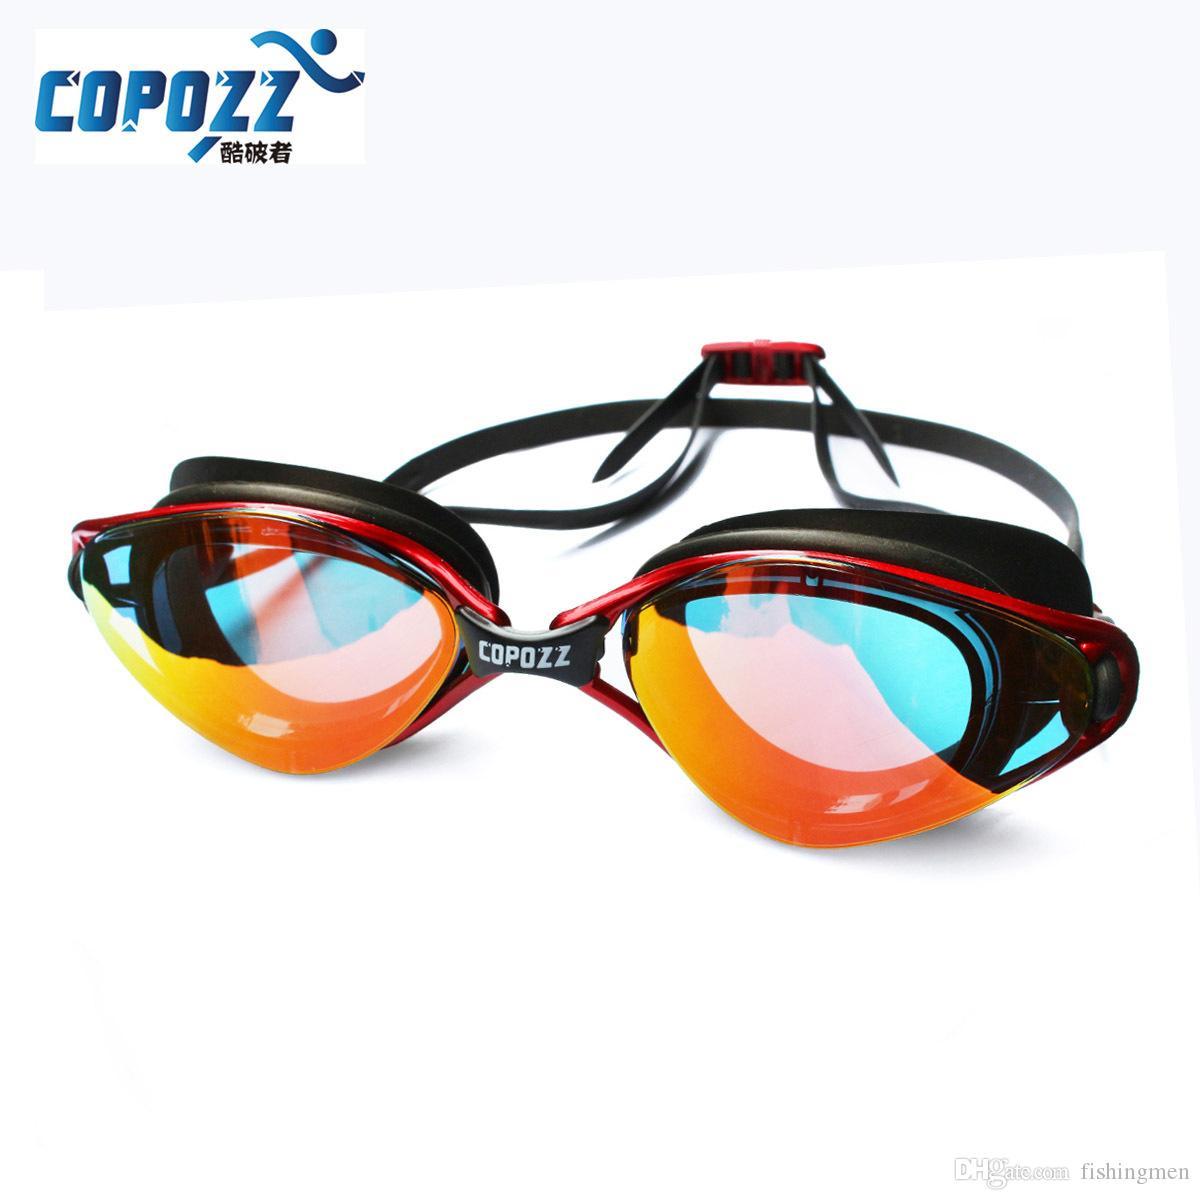 5f5bb51cdee Copozz New Professional Anti-Fog UV Protection Adjustable Swimming ...